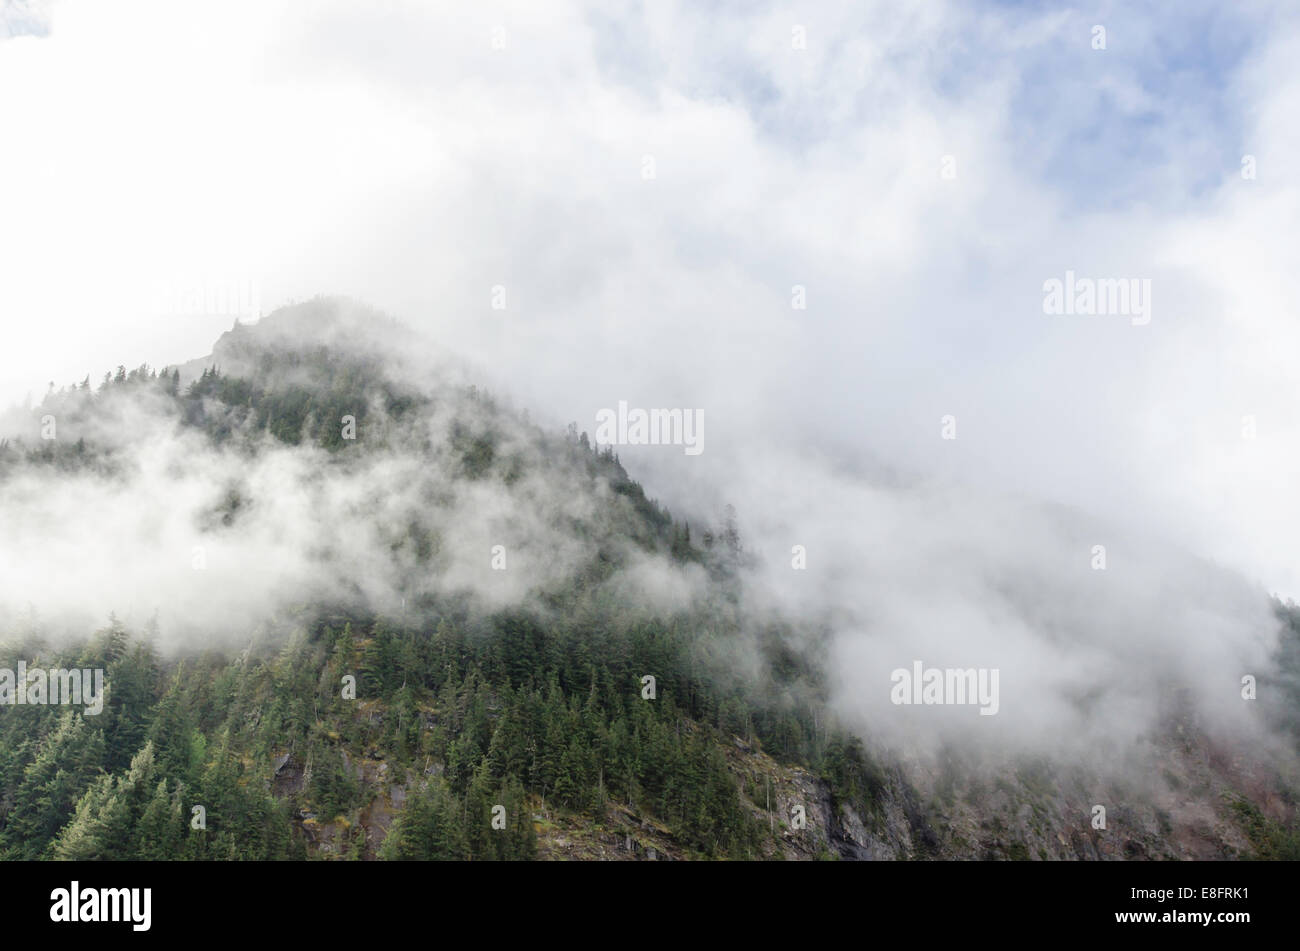 USA, Washington State, Mount Rainier National Park, Low clouds across mountain peak - Stock Image